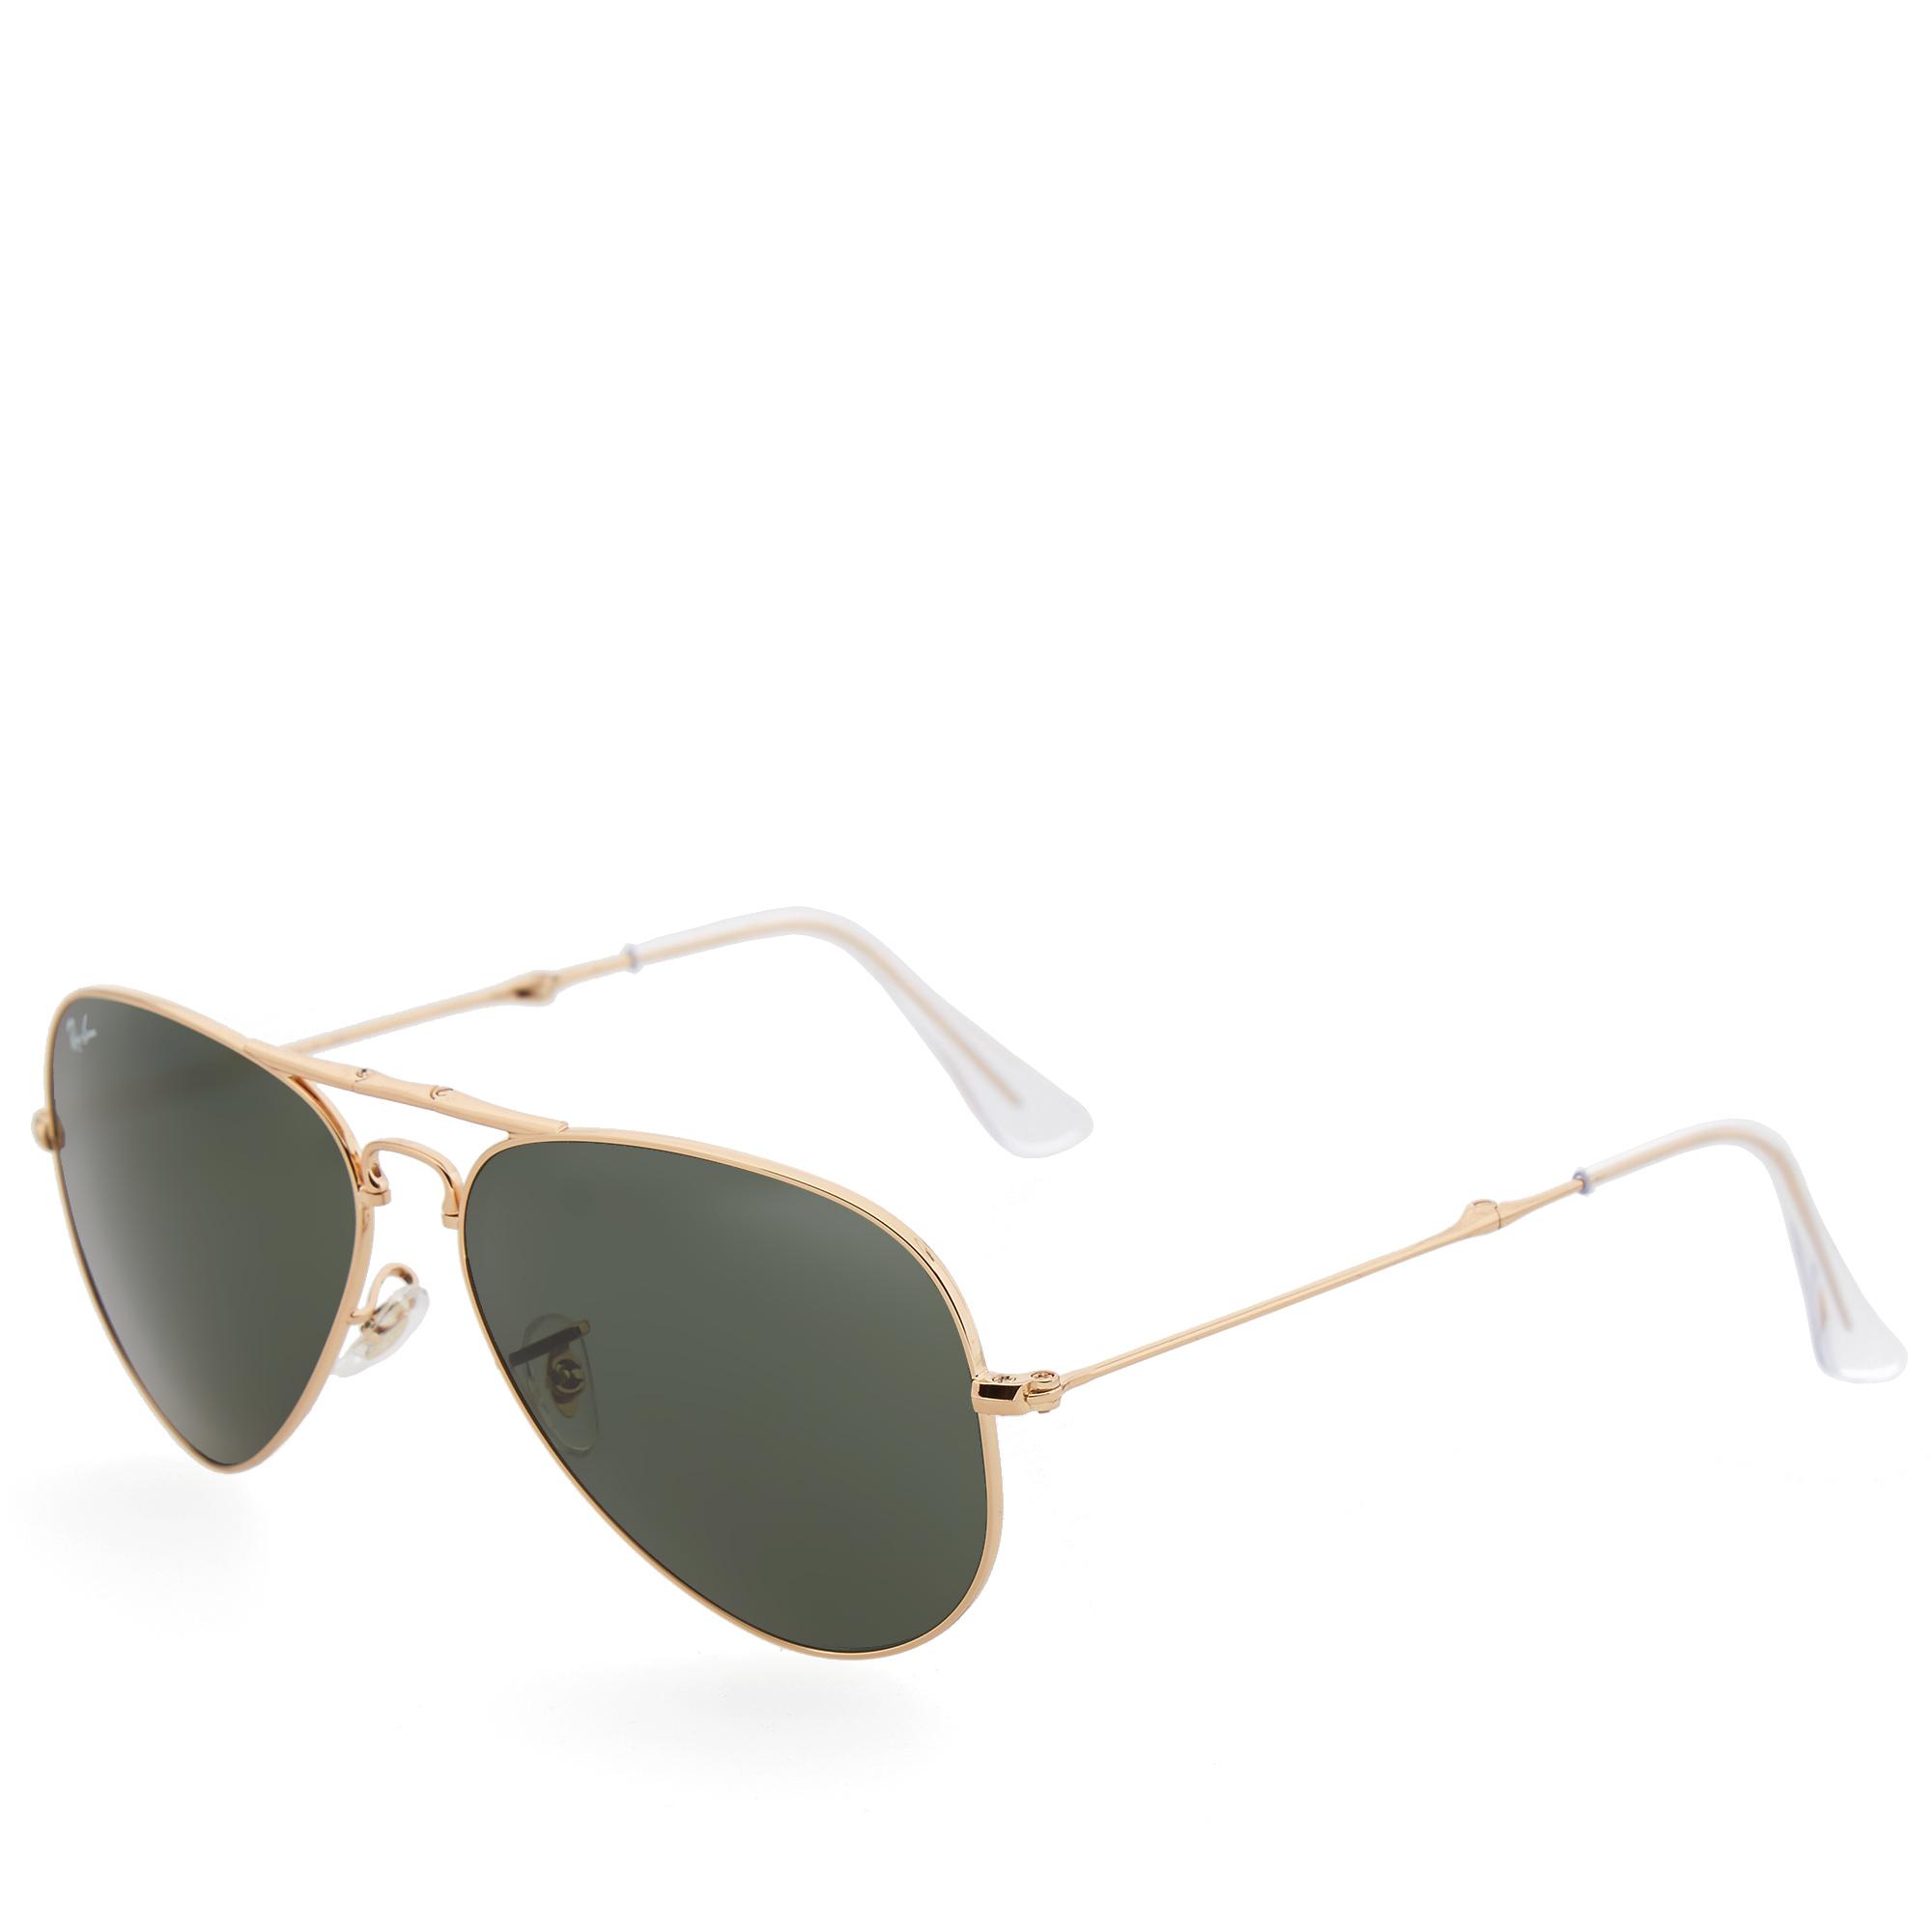 ray ban arista gold  Ray Ban Aviator Folding Sunglasses (Gold \u0026 Green)